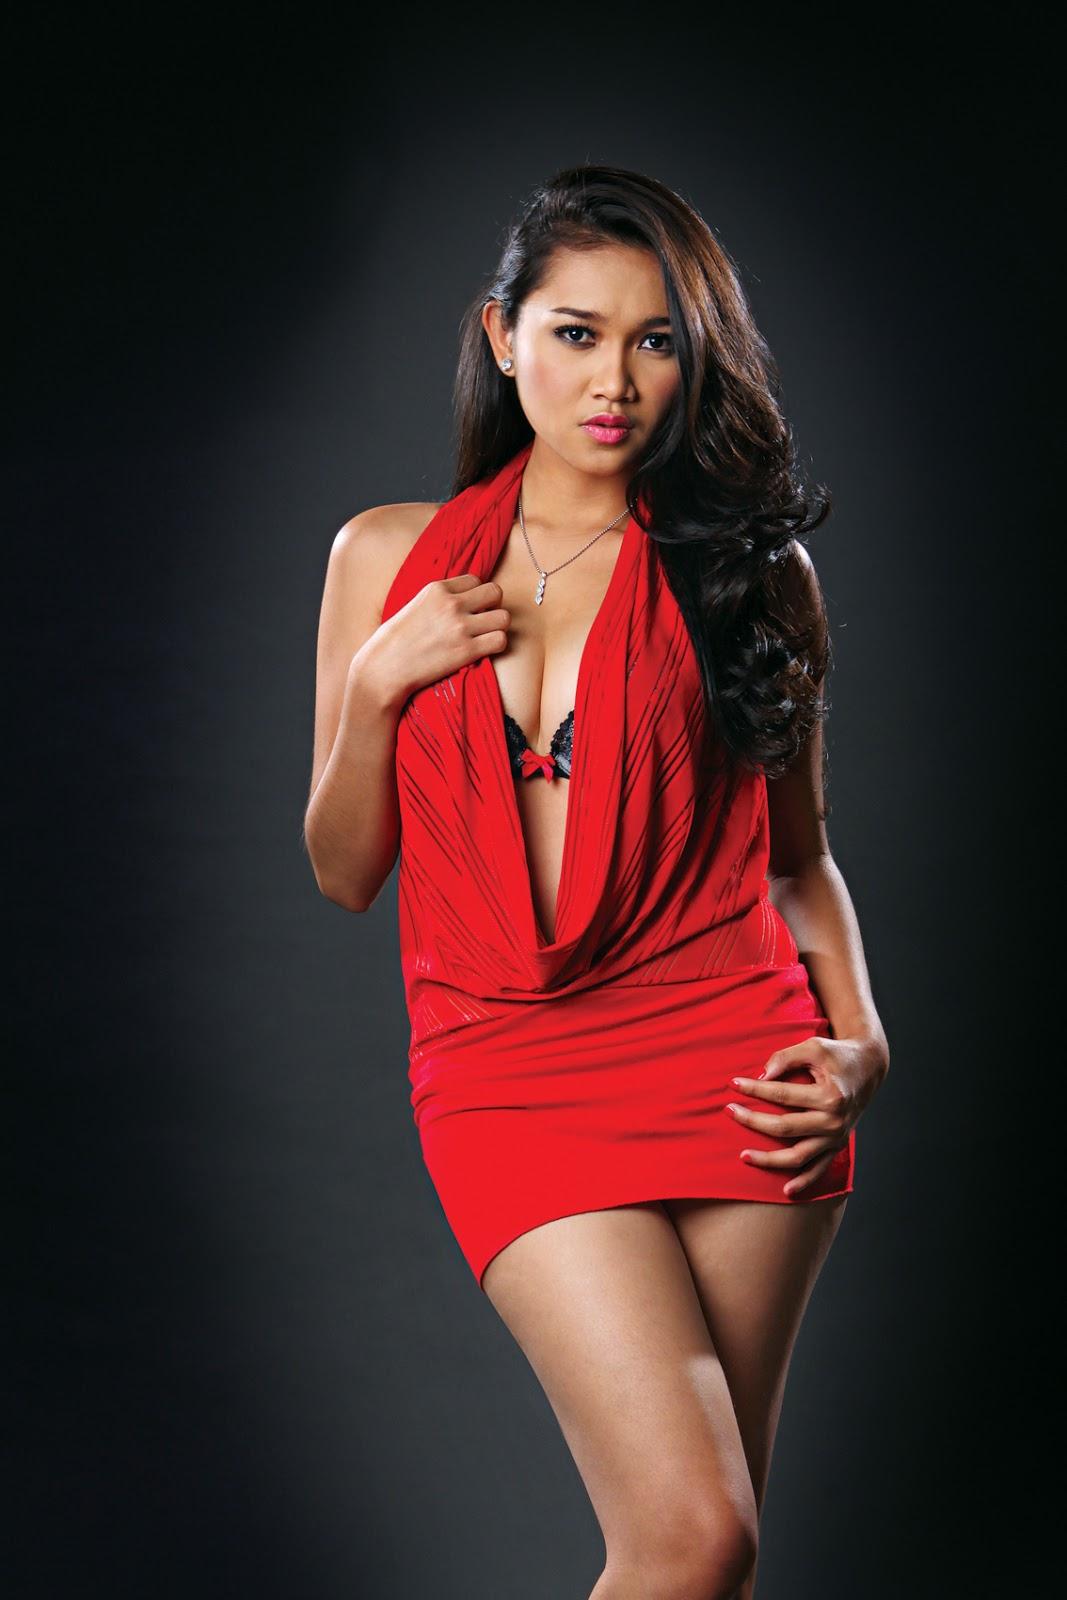 foto paha mulus cewek cewek igo artis cantik Rini Septyarini dengan Gaun Merah Pendek indonesia